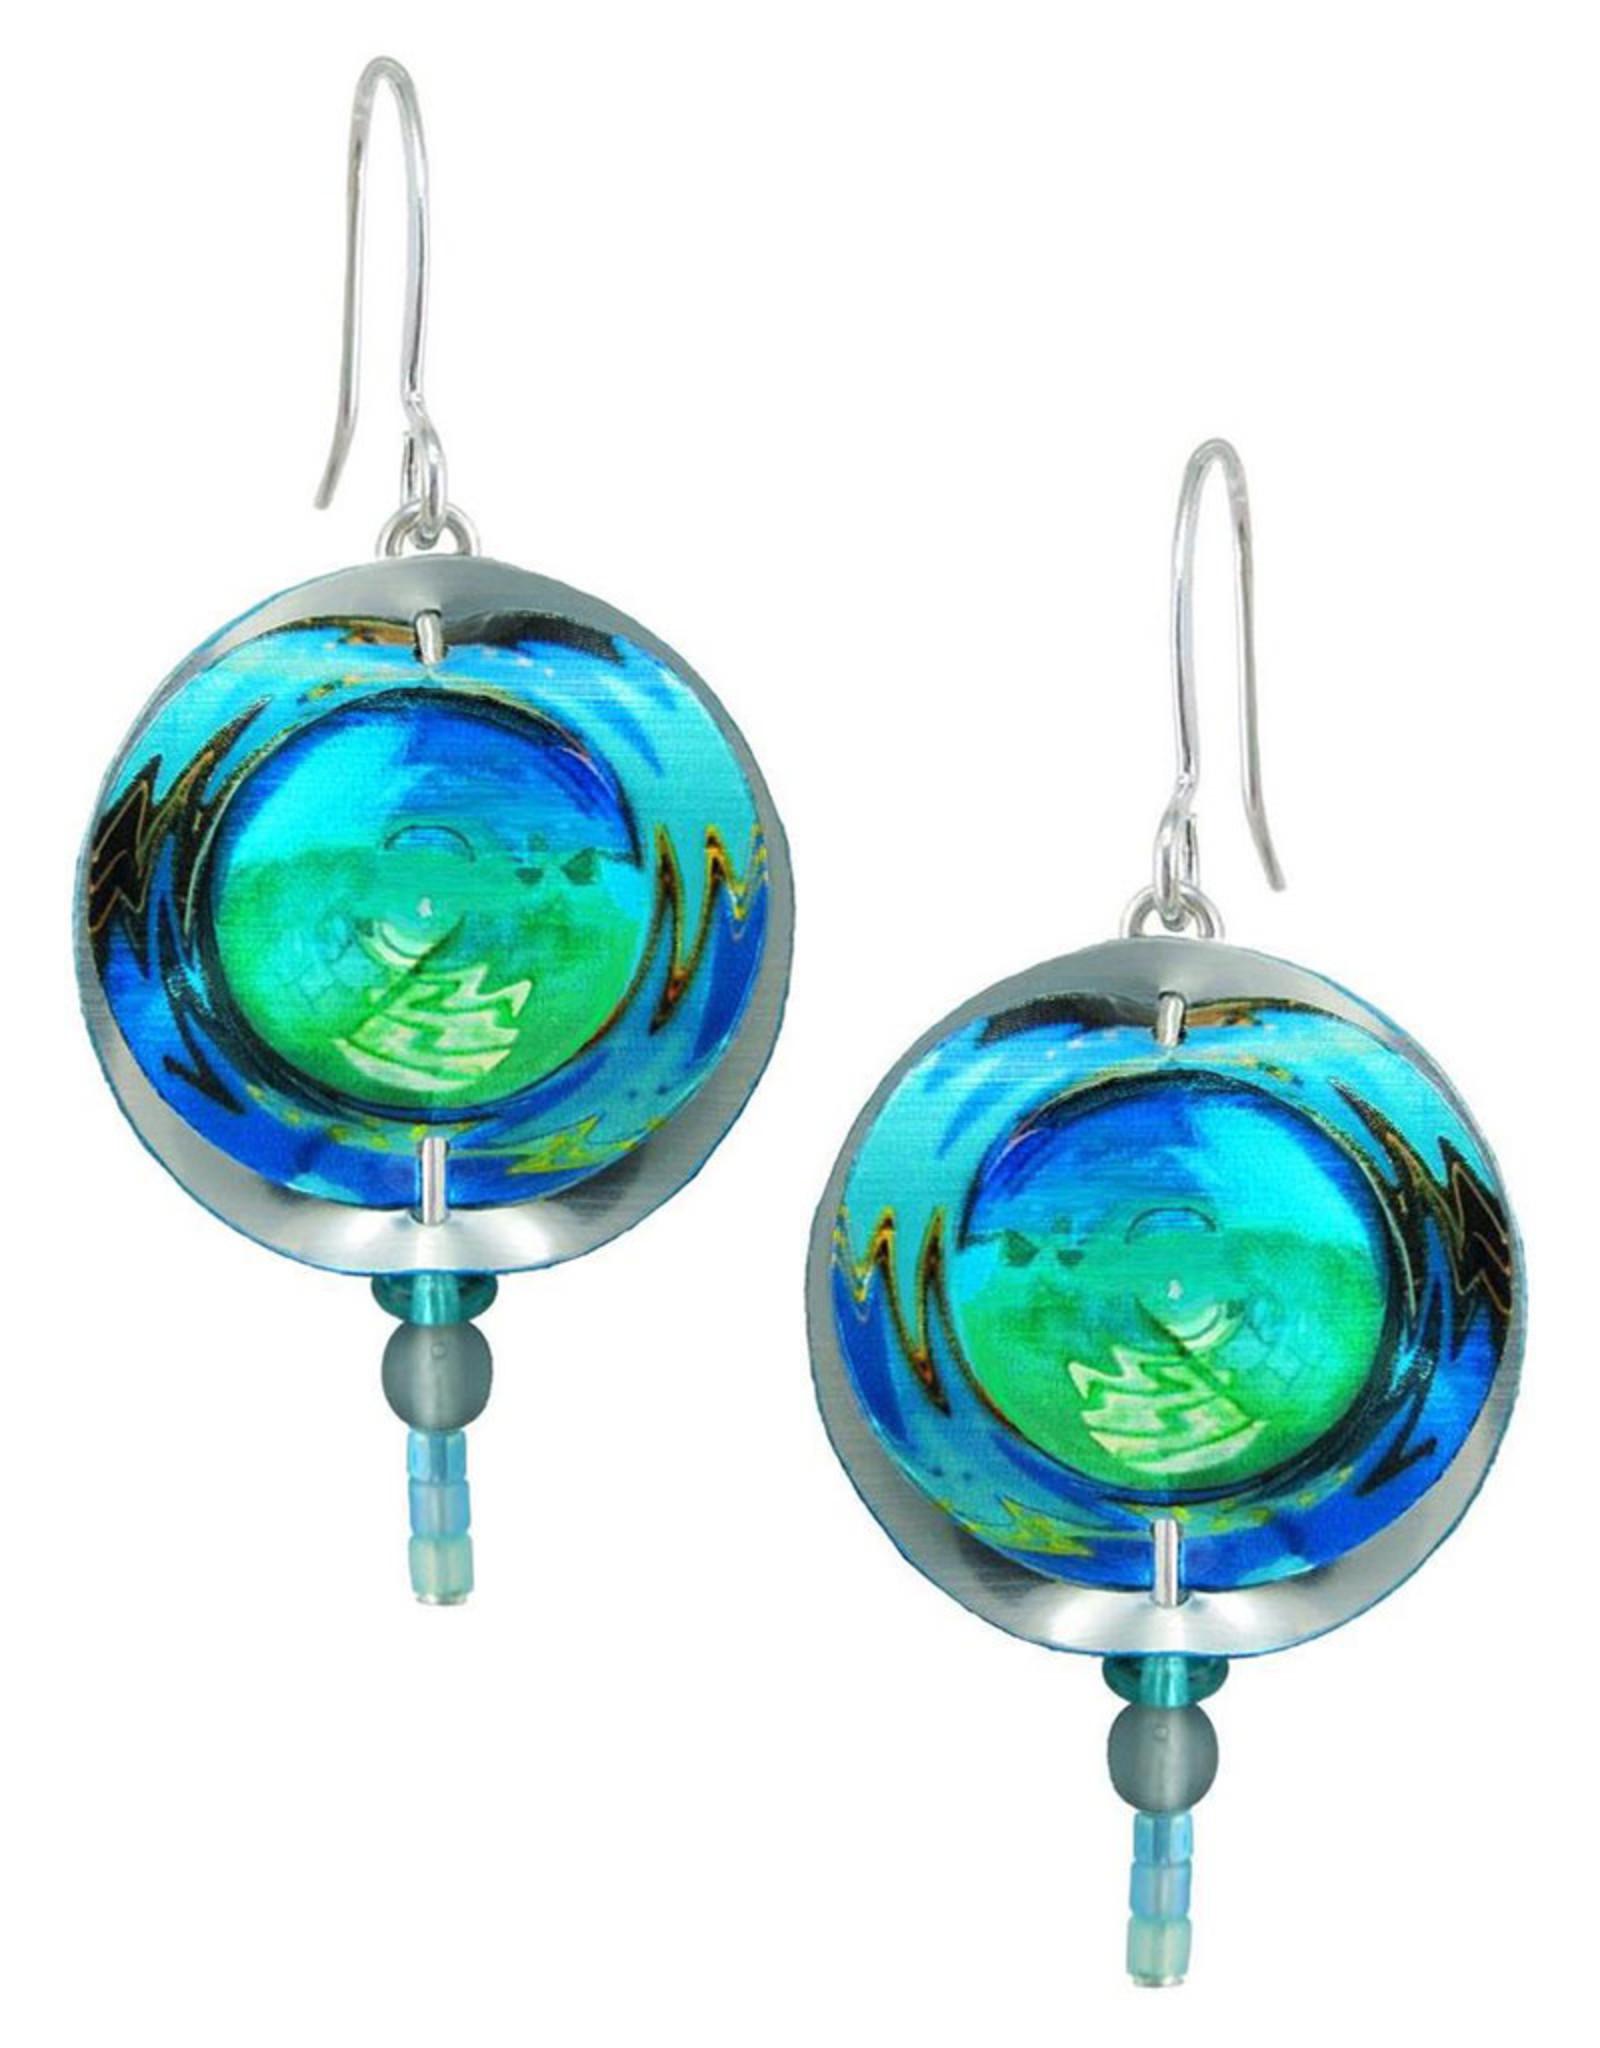 SINGERMAN & POST BLUE PLANET EARRINGS